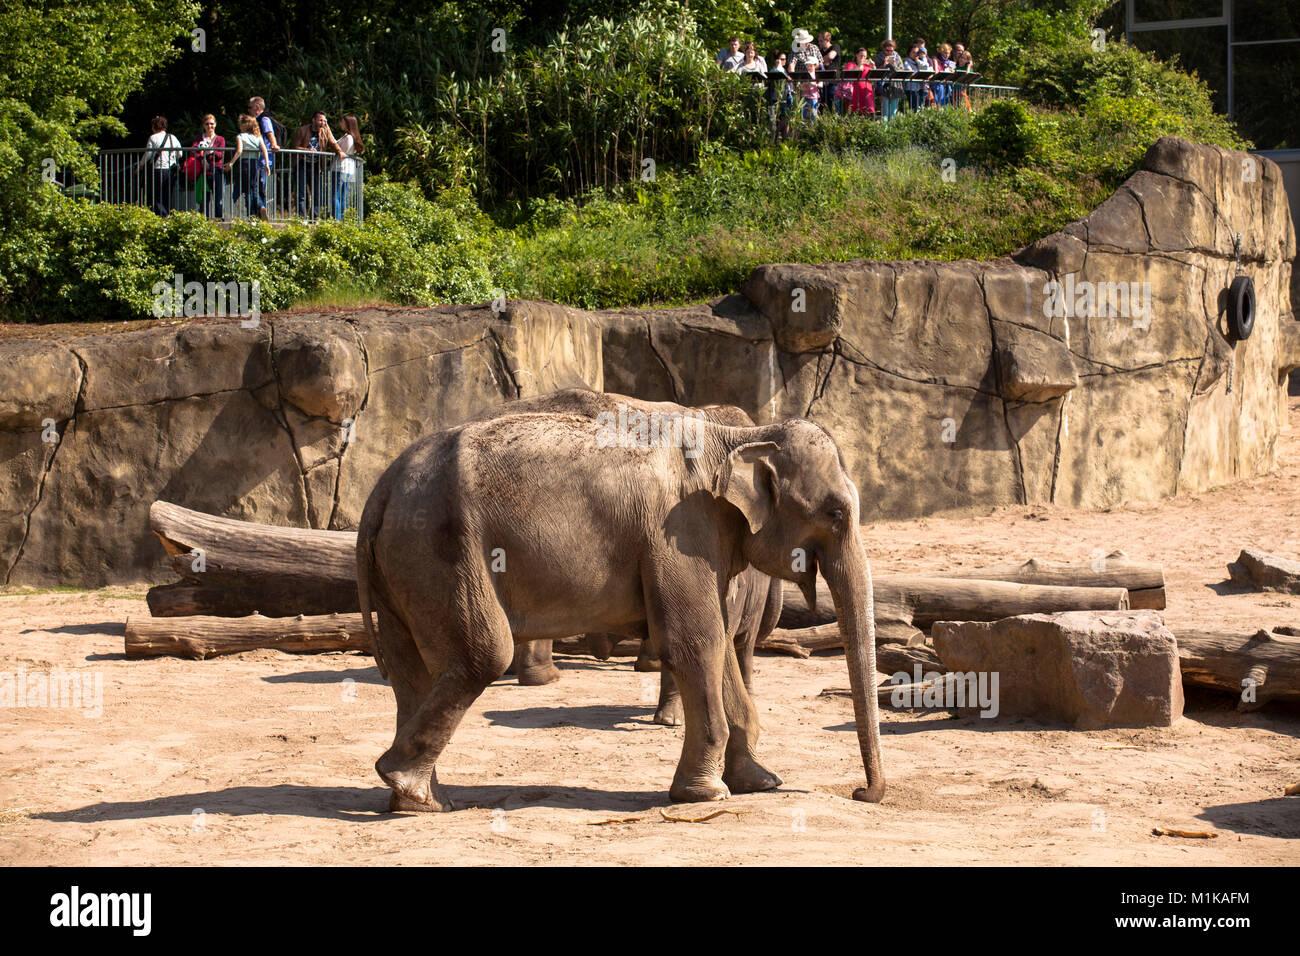 Zoo im Berlin Zoological